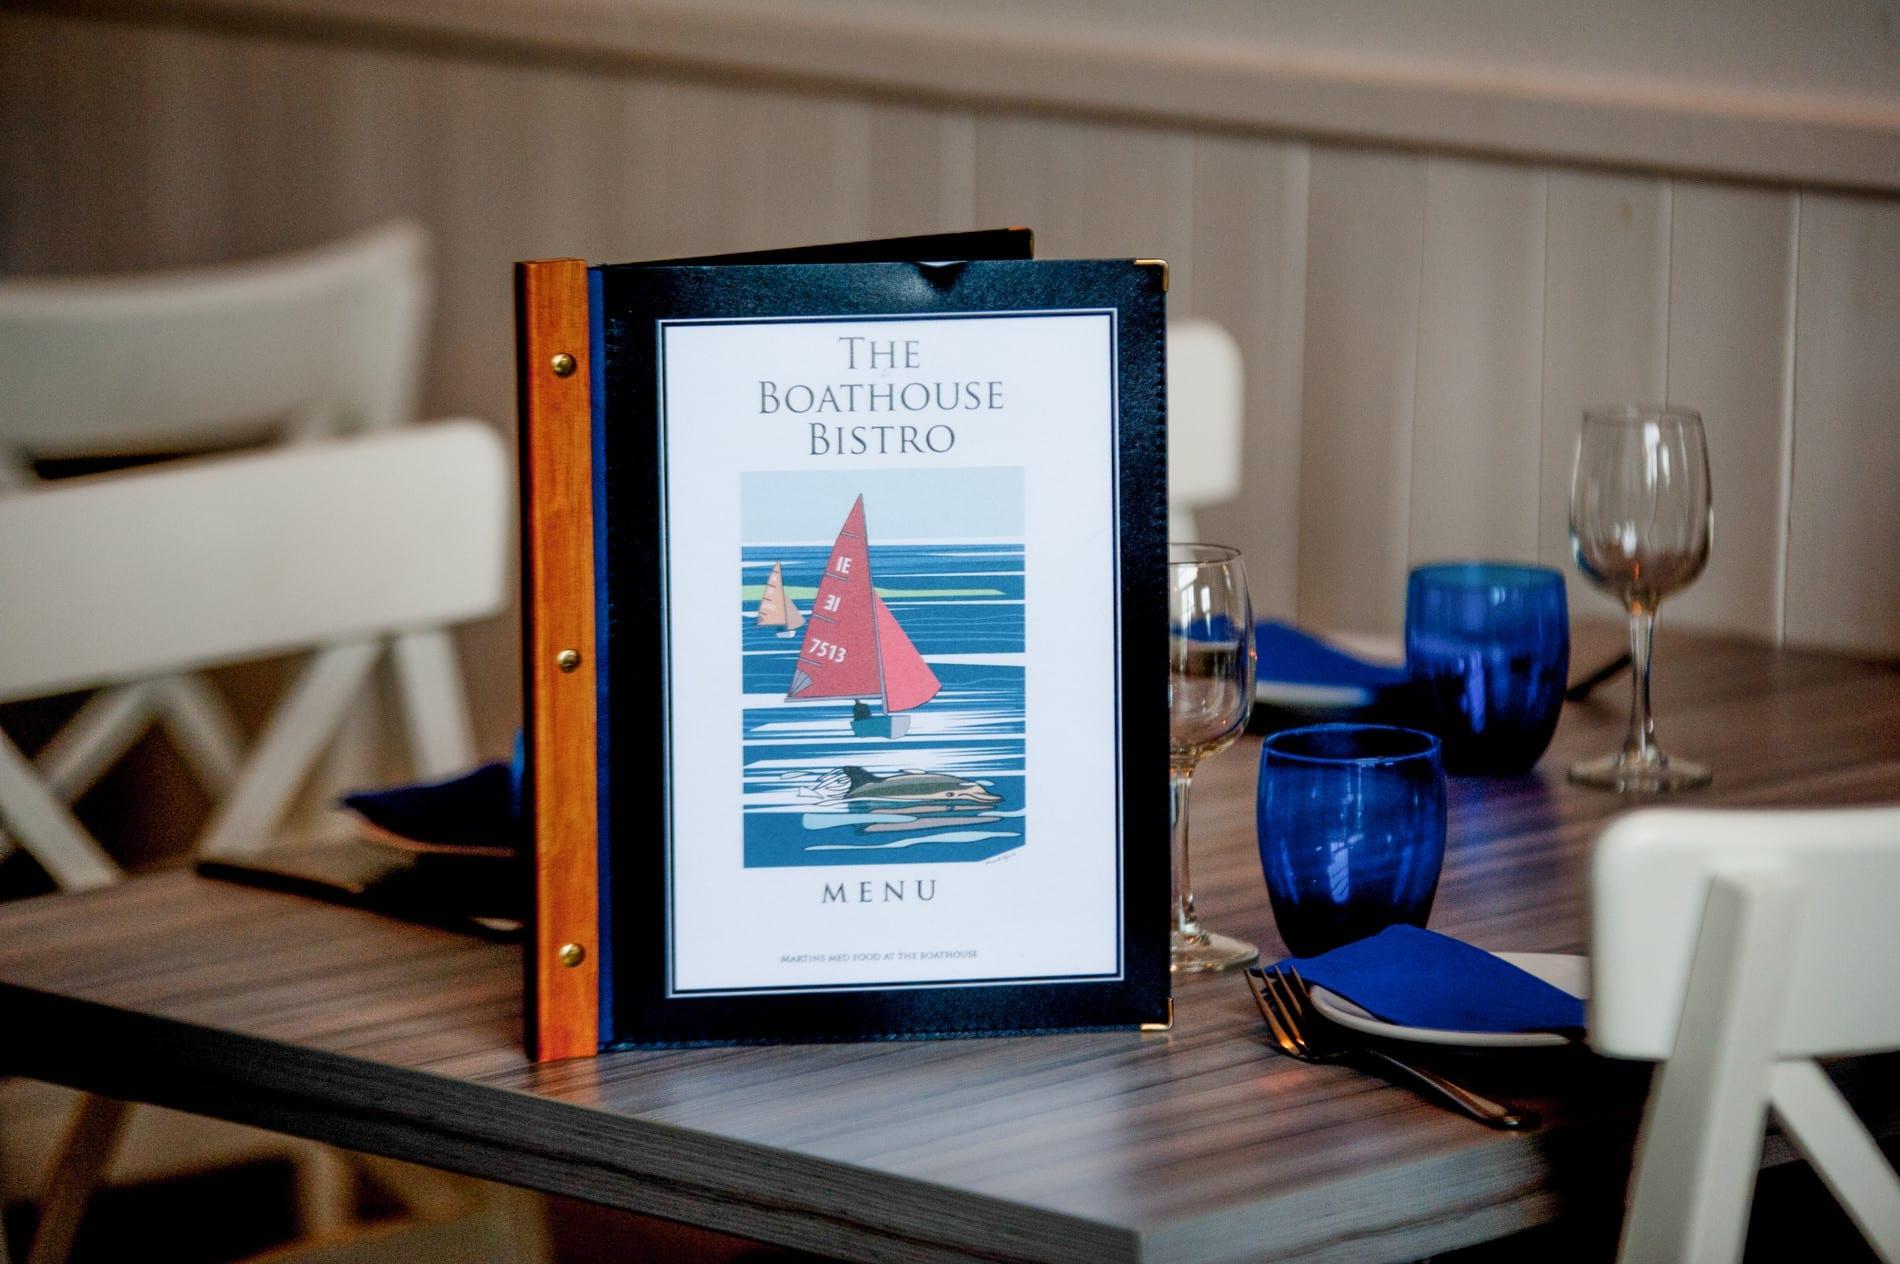 Wedding Anniversary at Dromquinna Boathouse